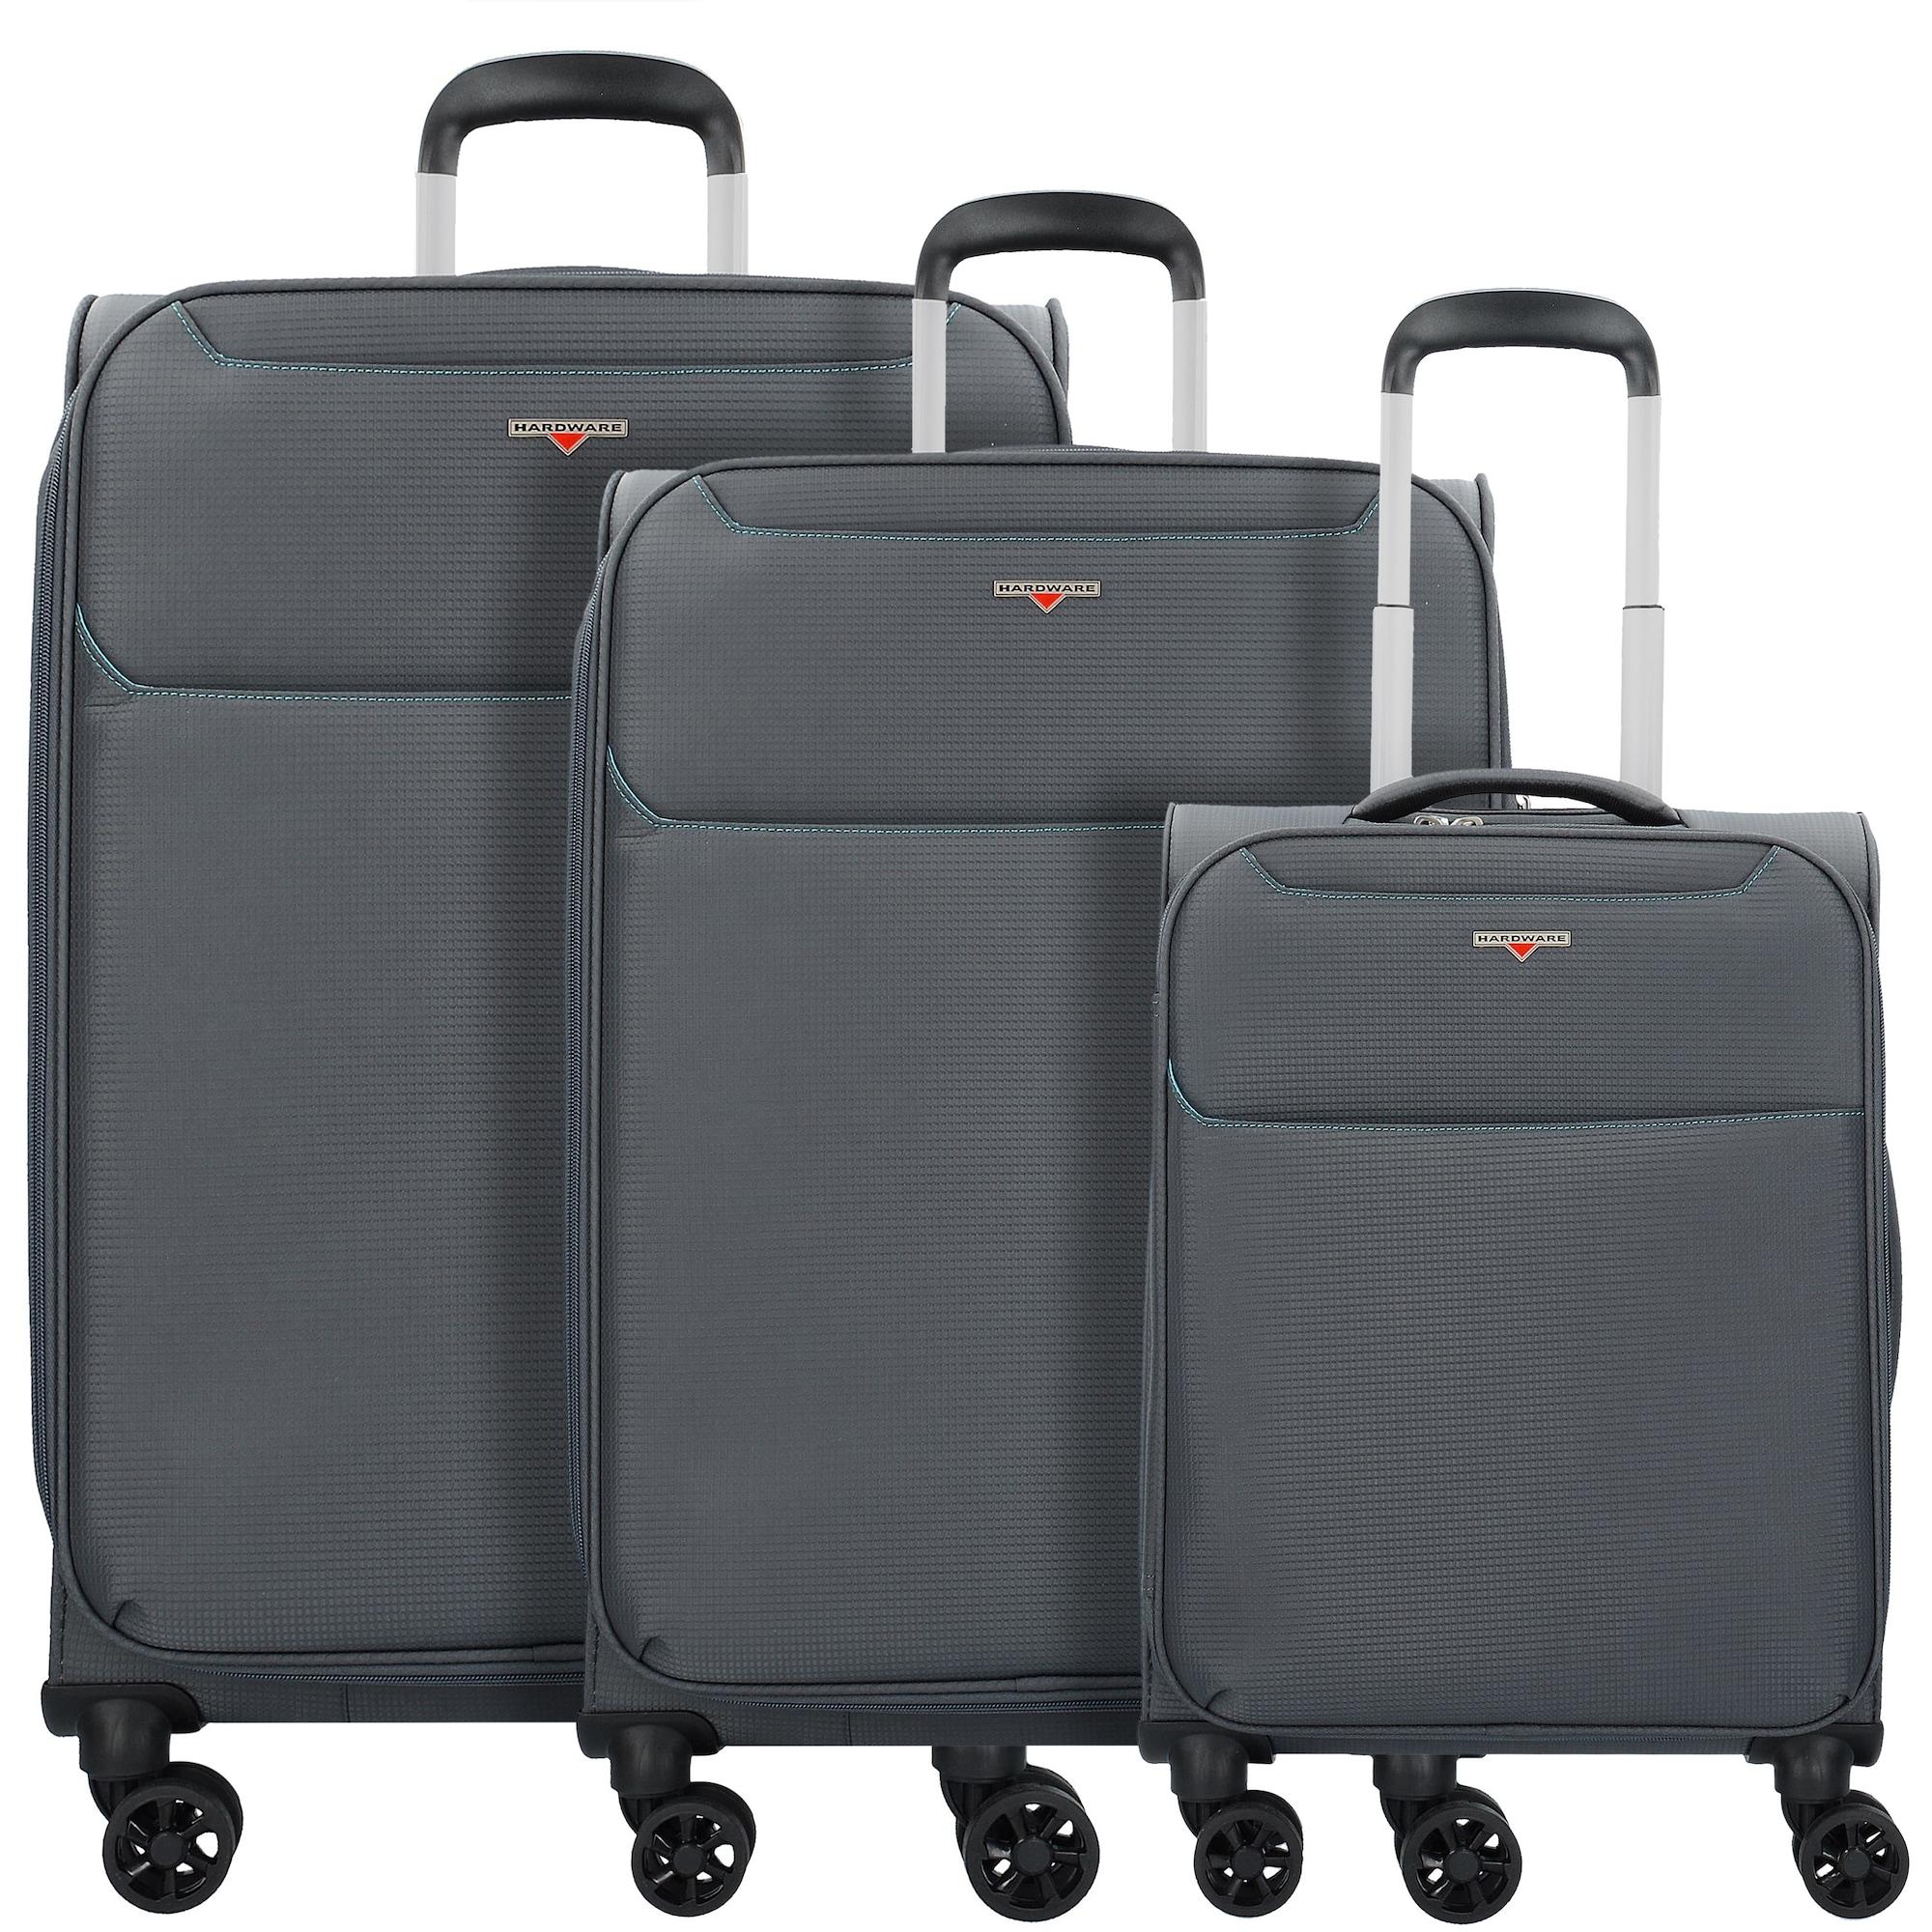 Kofferset | Taschen > Koffer & Trolleys > Koffersets | Hardware